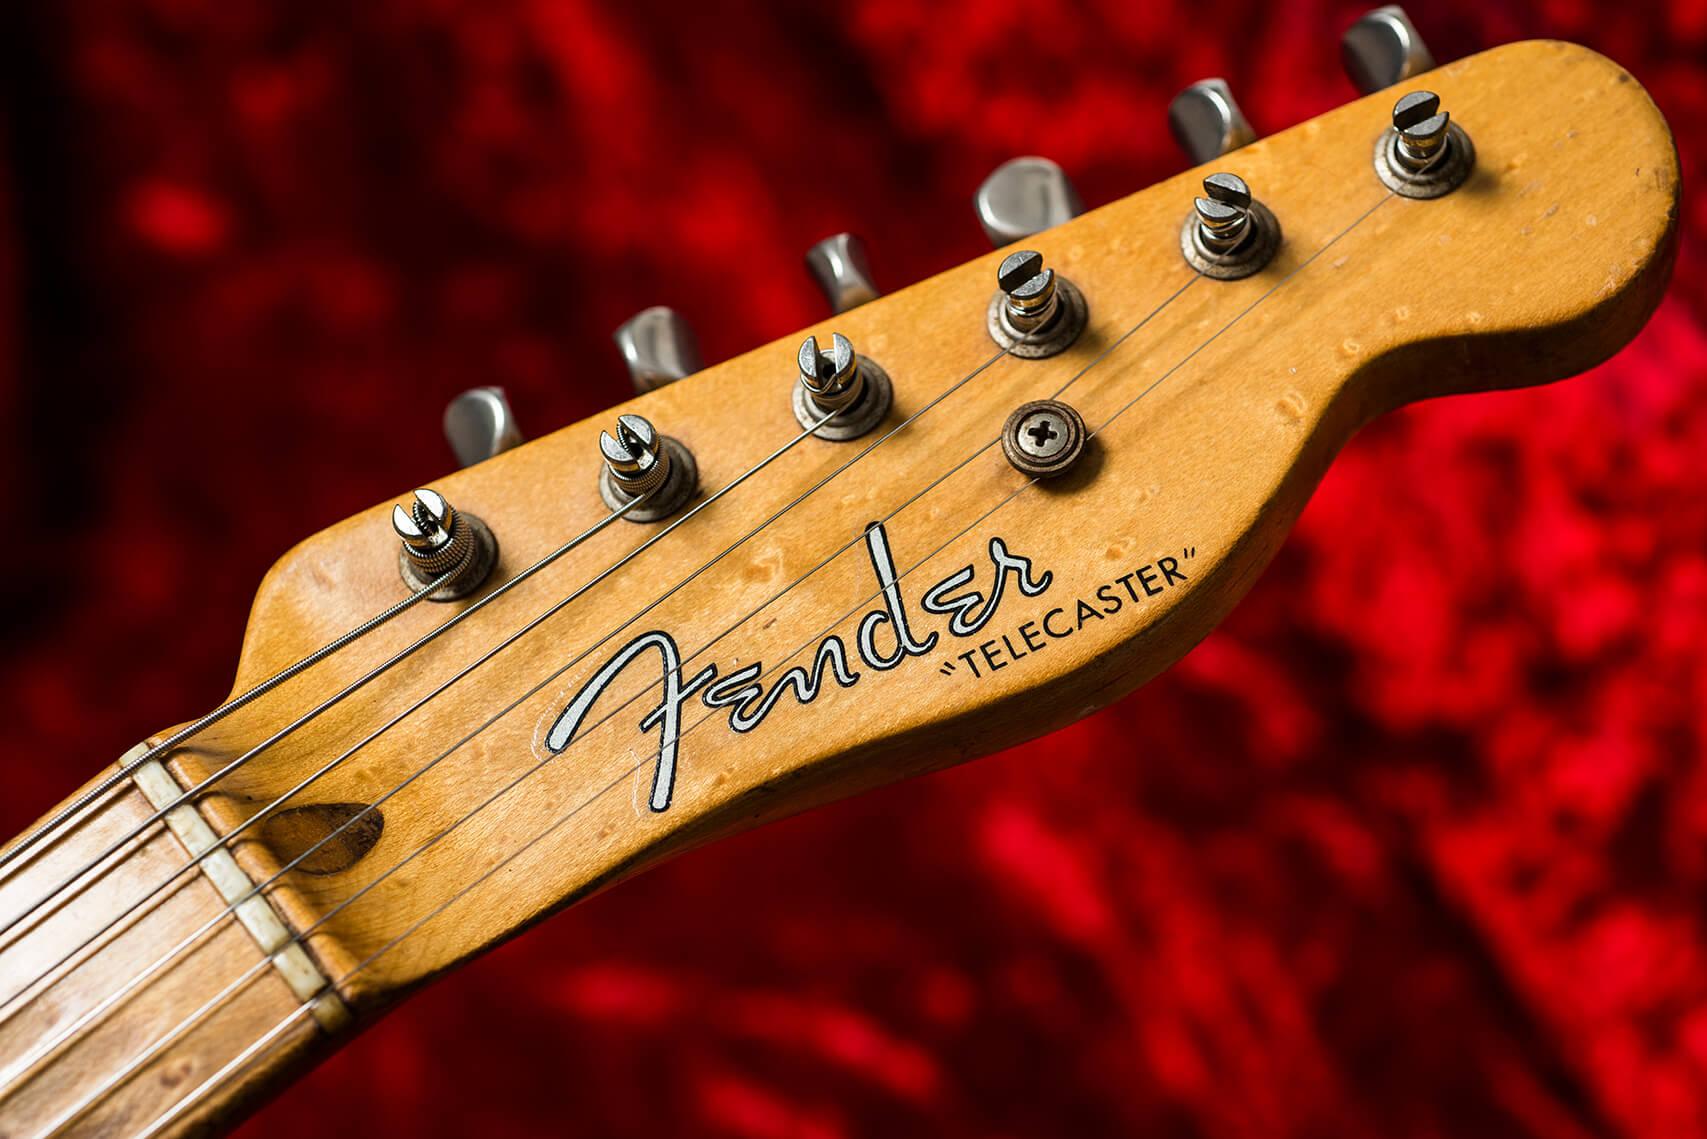 Jeff Garlin's 1953 Fender Telecaster Headstock